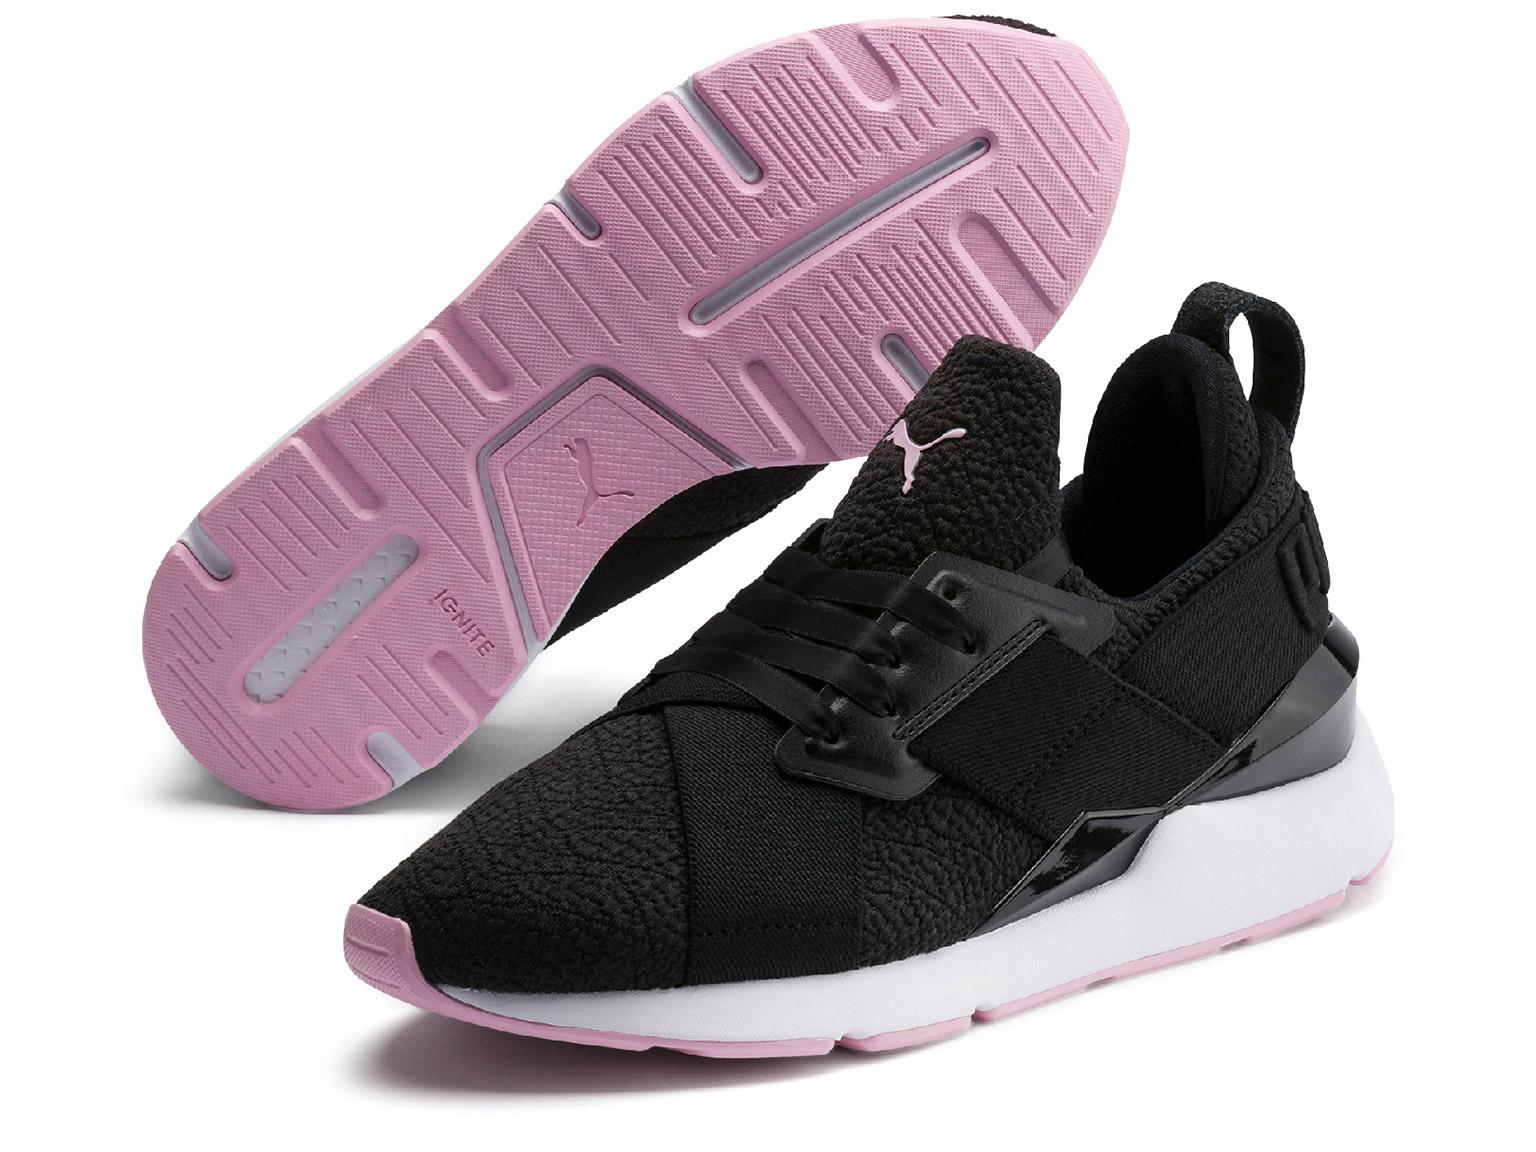 PUMA And Cara Delevingne Drop Muse Trailblazer Sneaker